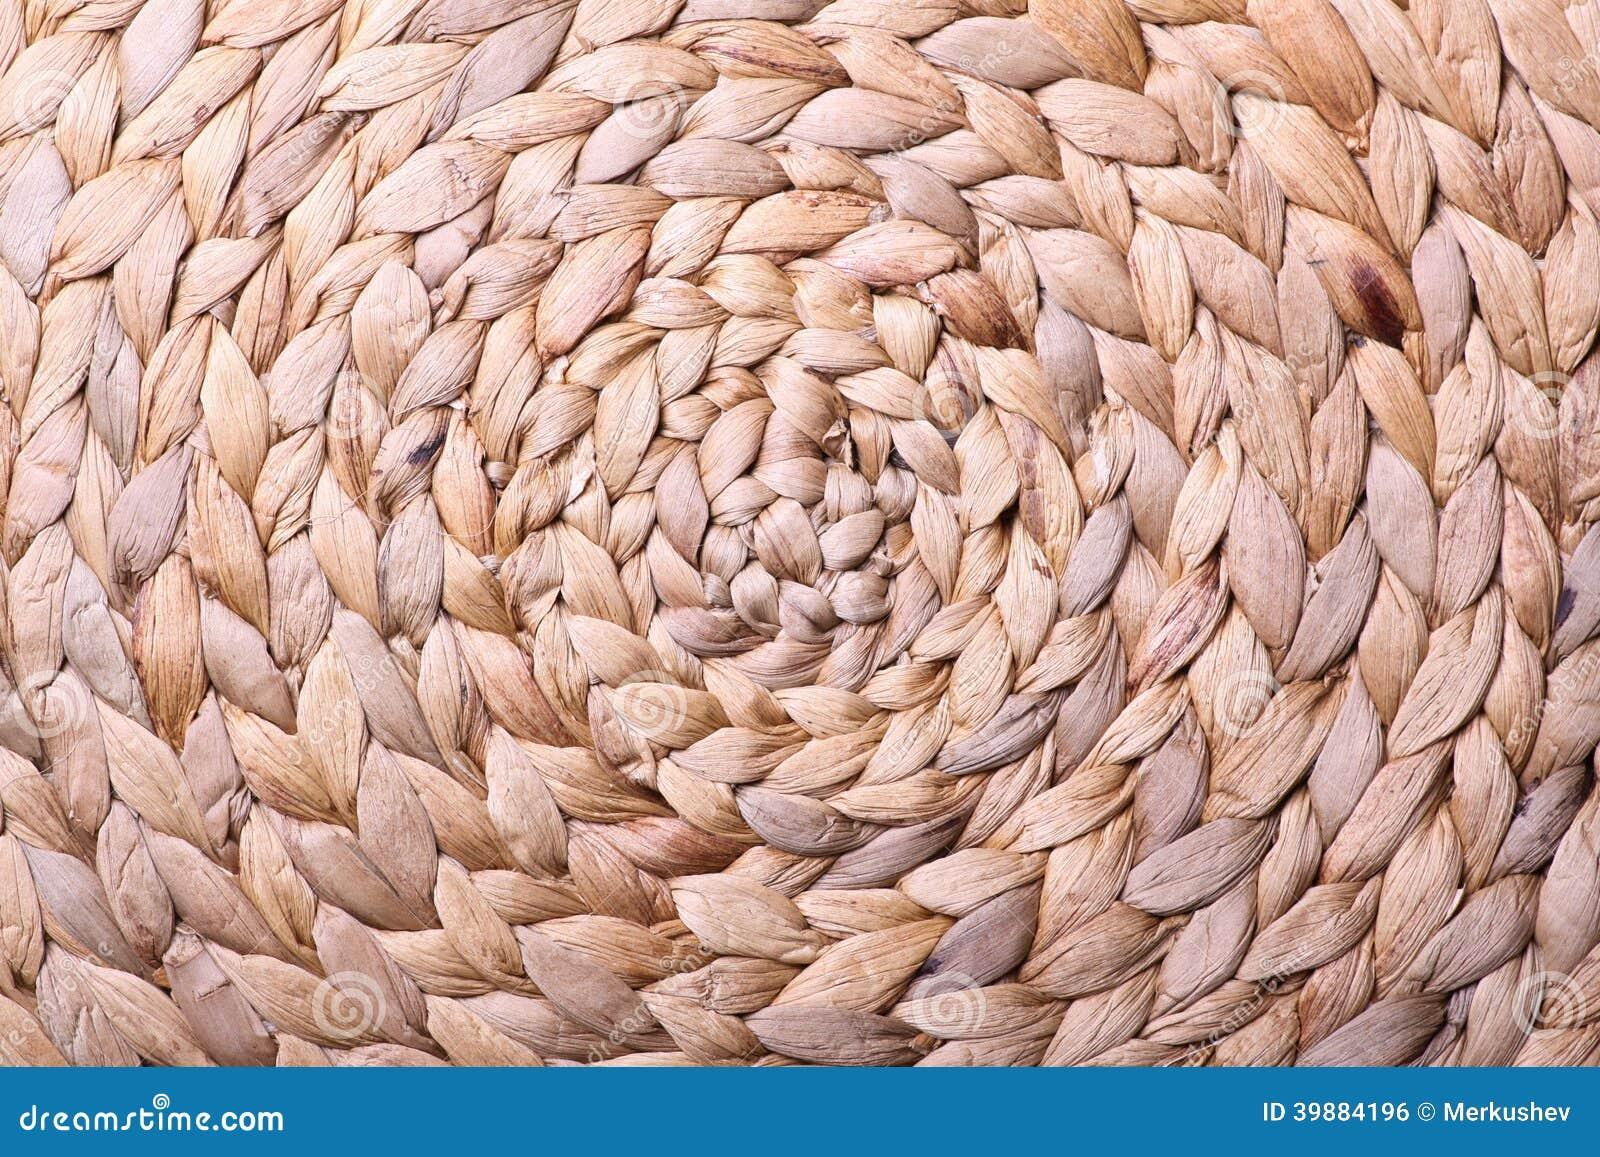 modele de tapis en osier photo stock image 39884196 With tapis en osier